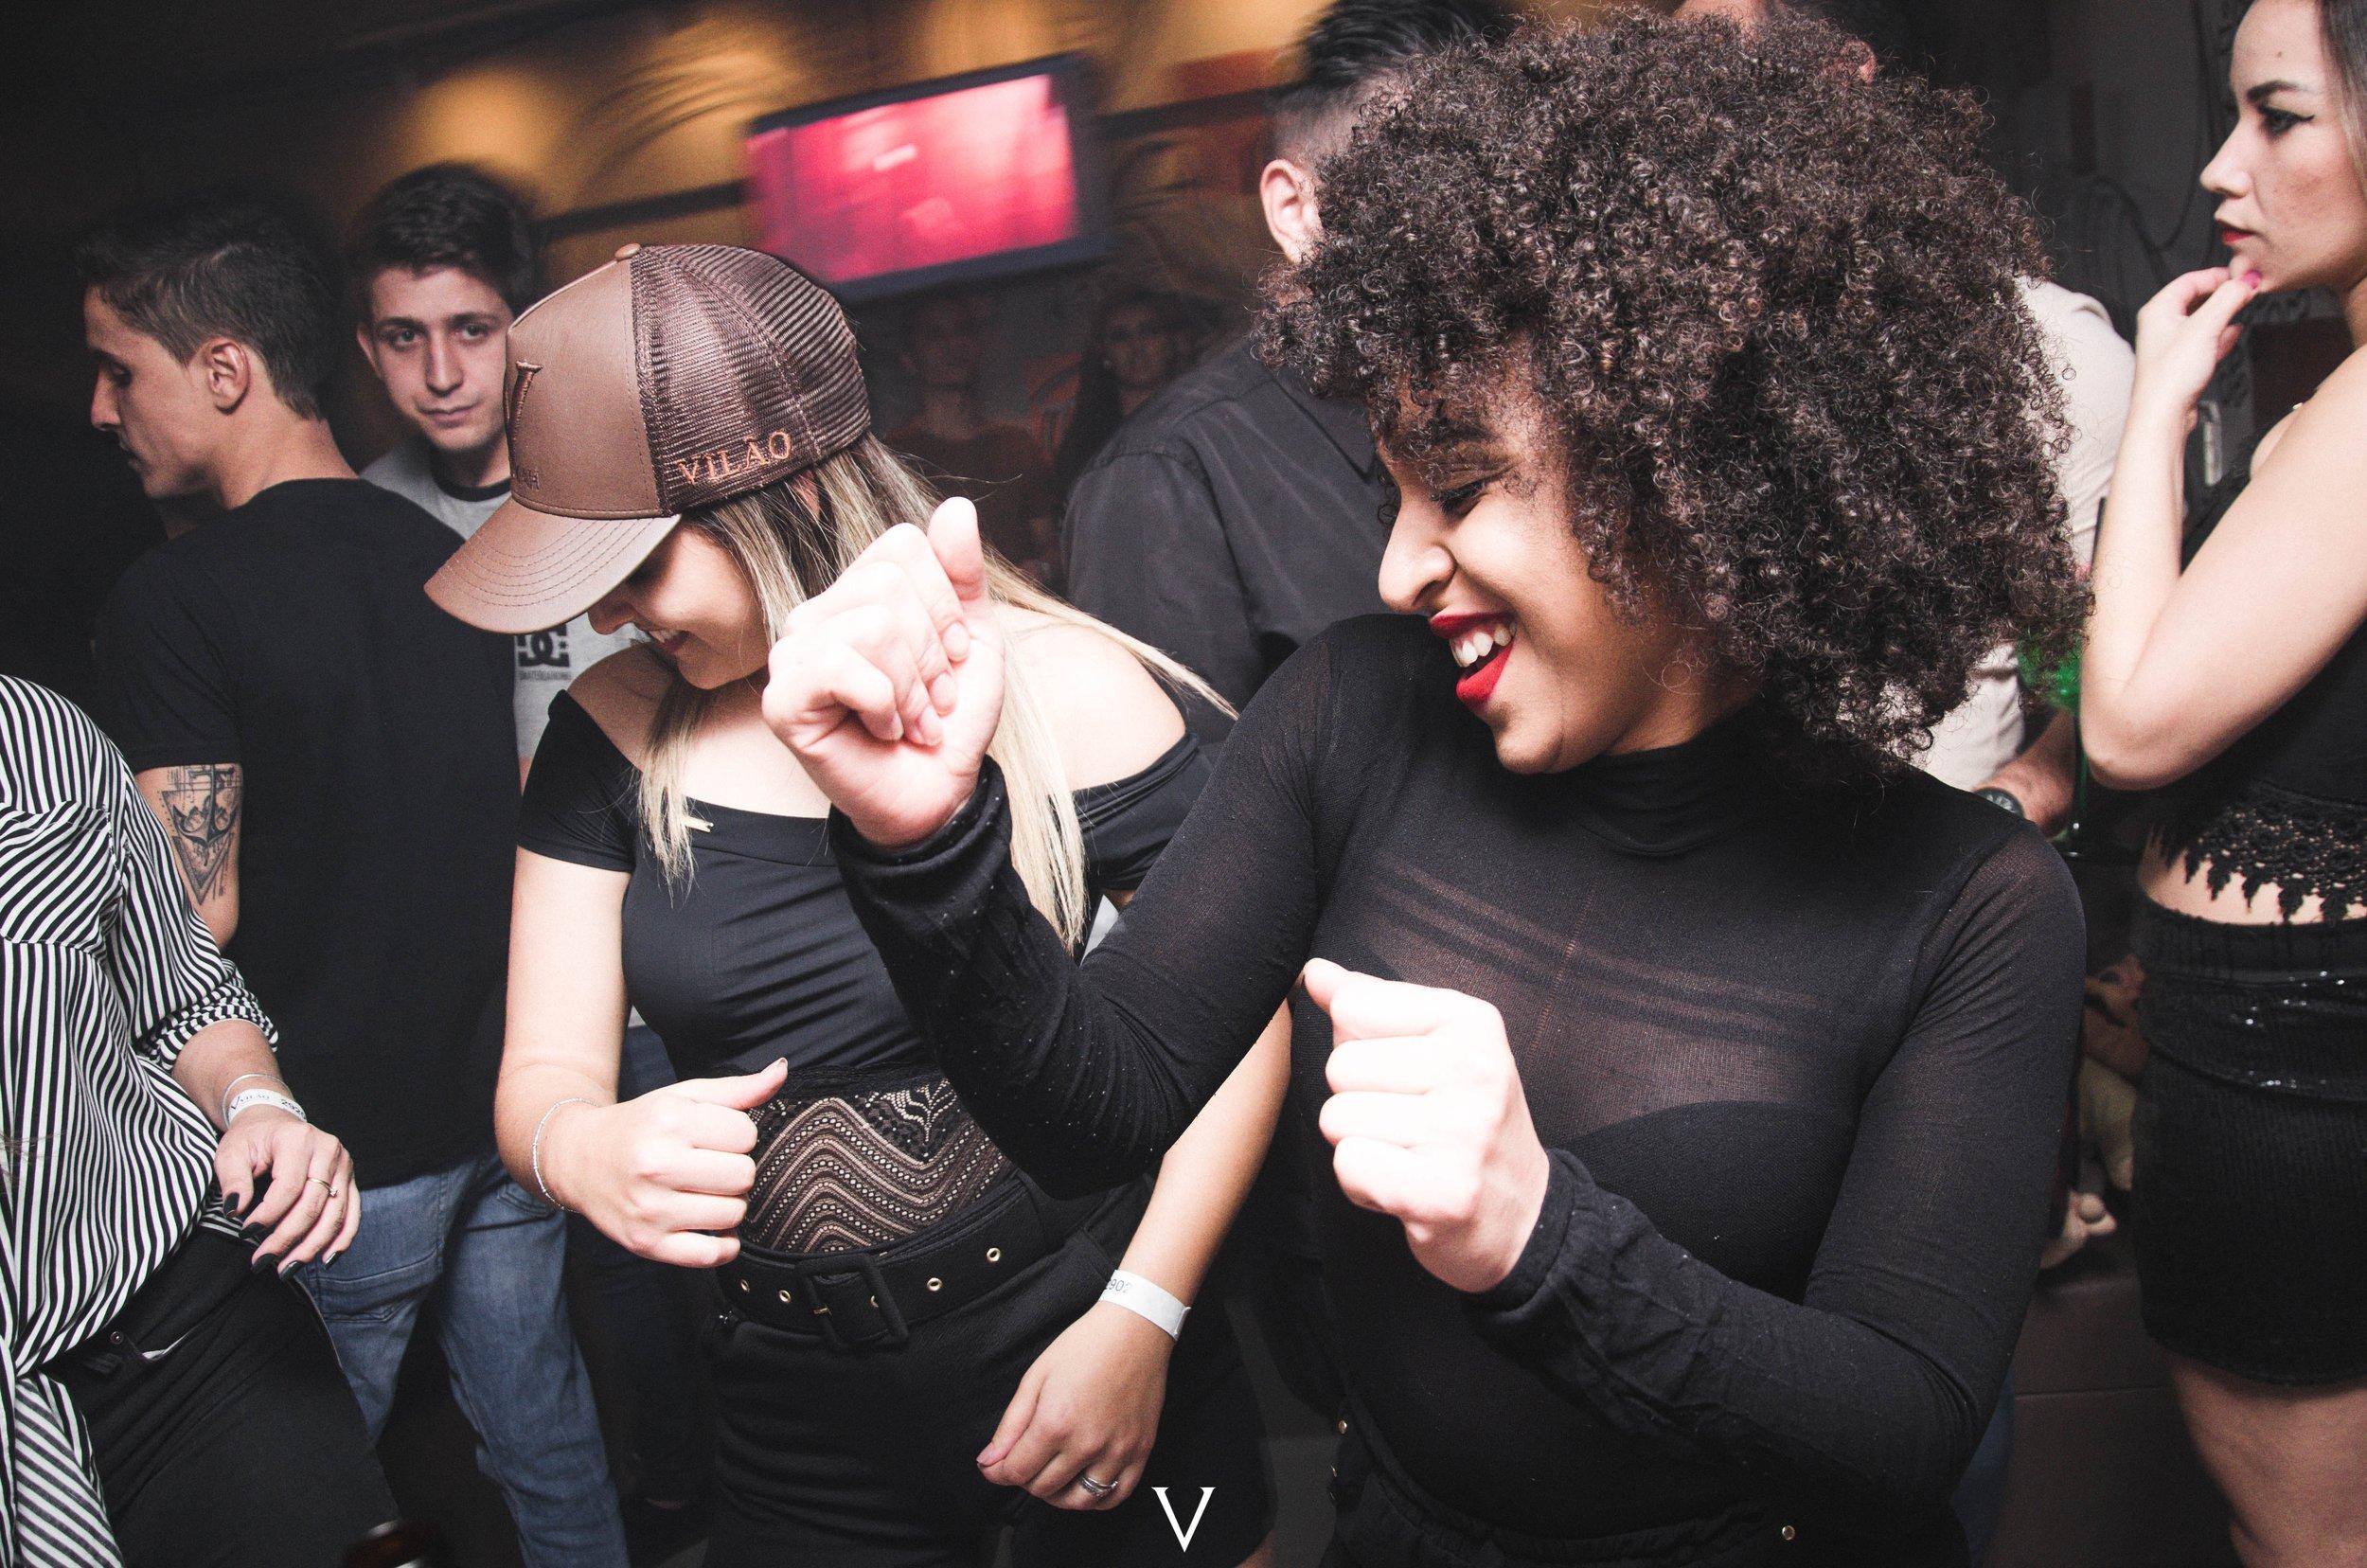 crowd-dancing-fashion-1304472.jpg